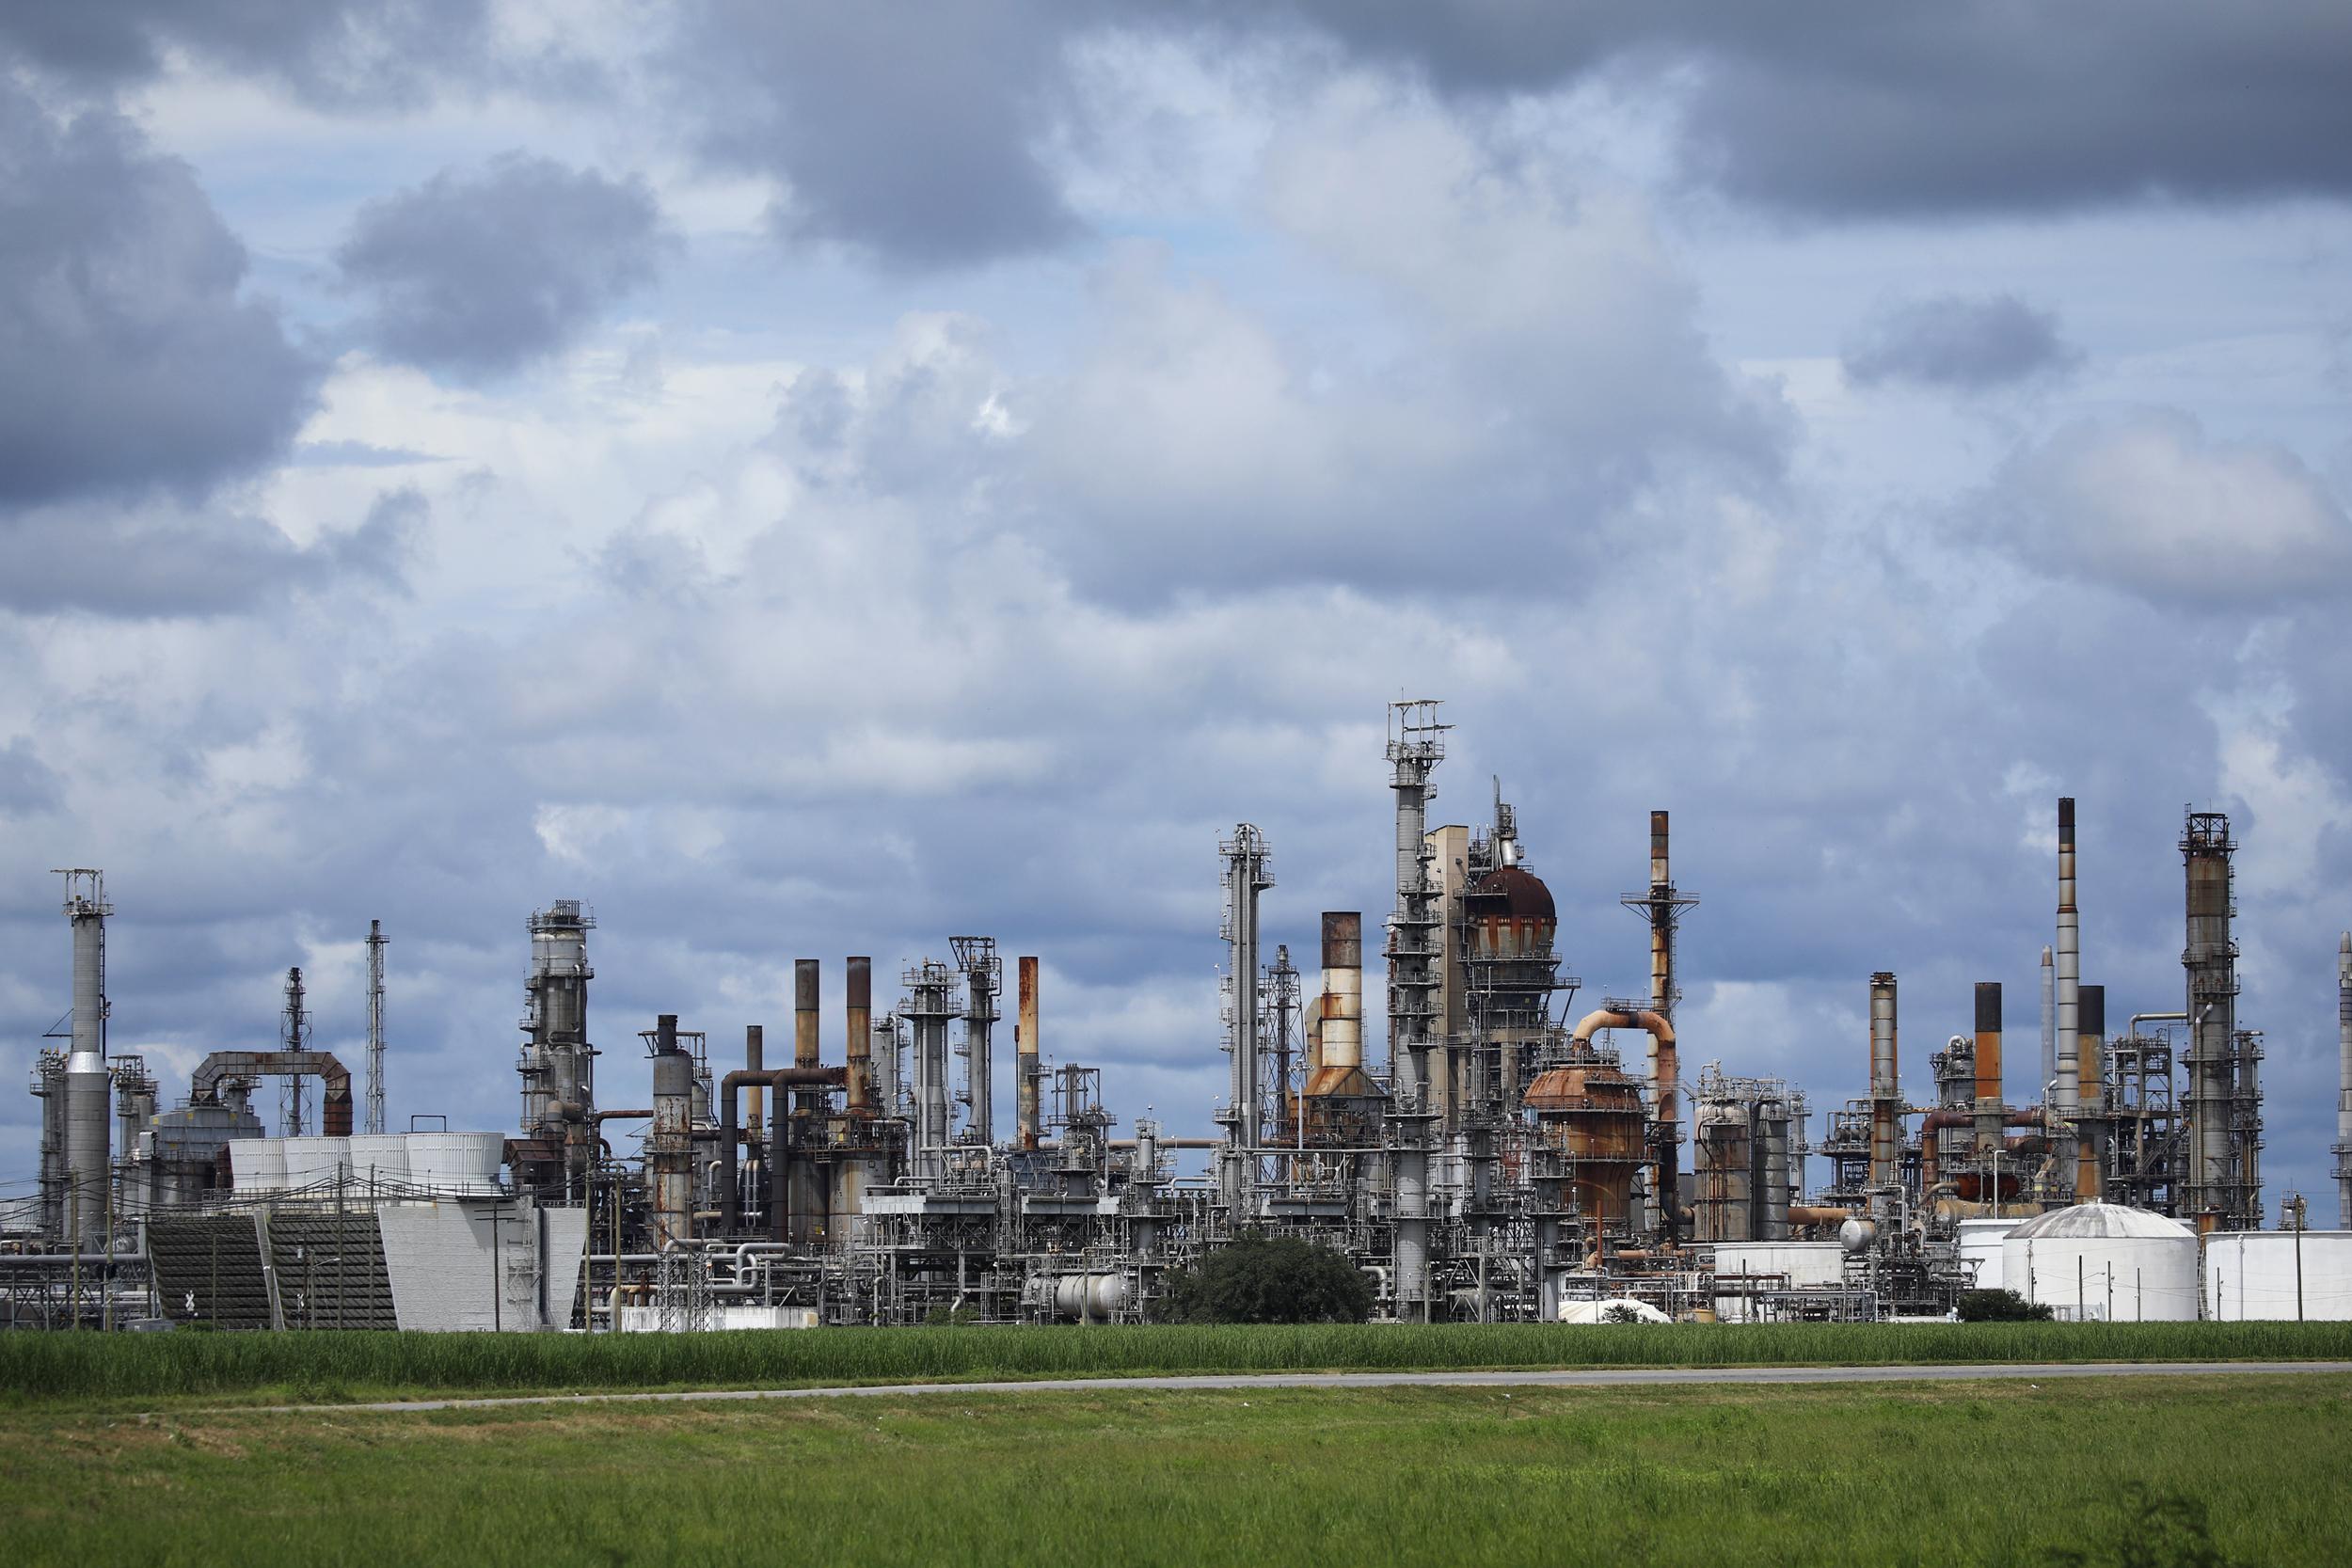 Oil and gas companies evacuate employees, slash production ahead of Hurricane Ida